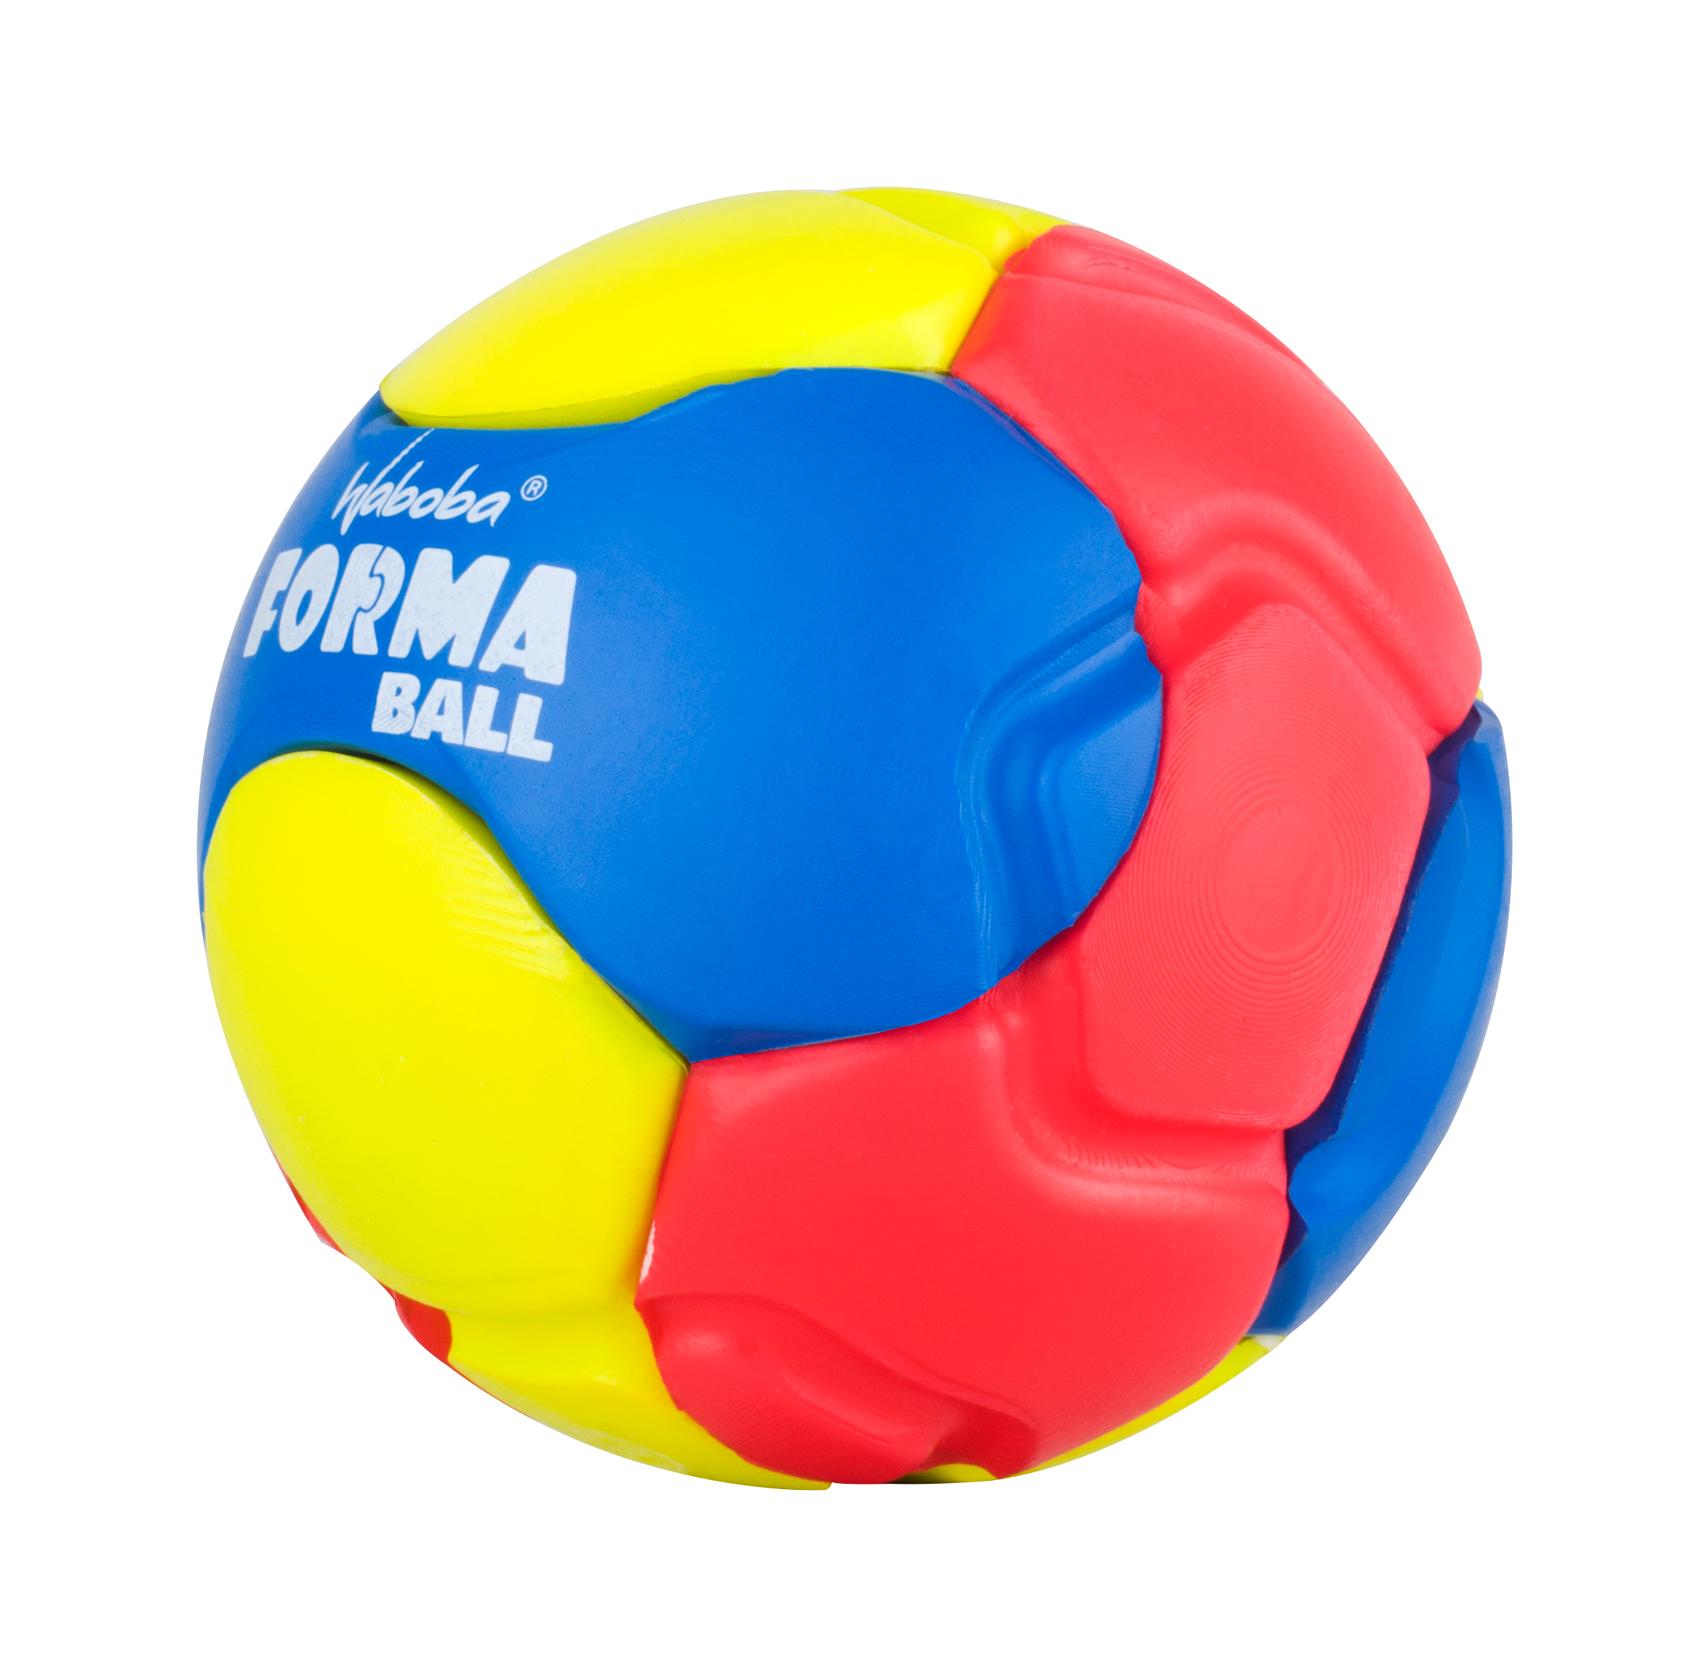 Waboba Forma Ball Πλαΐνη